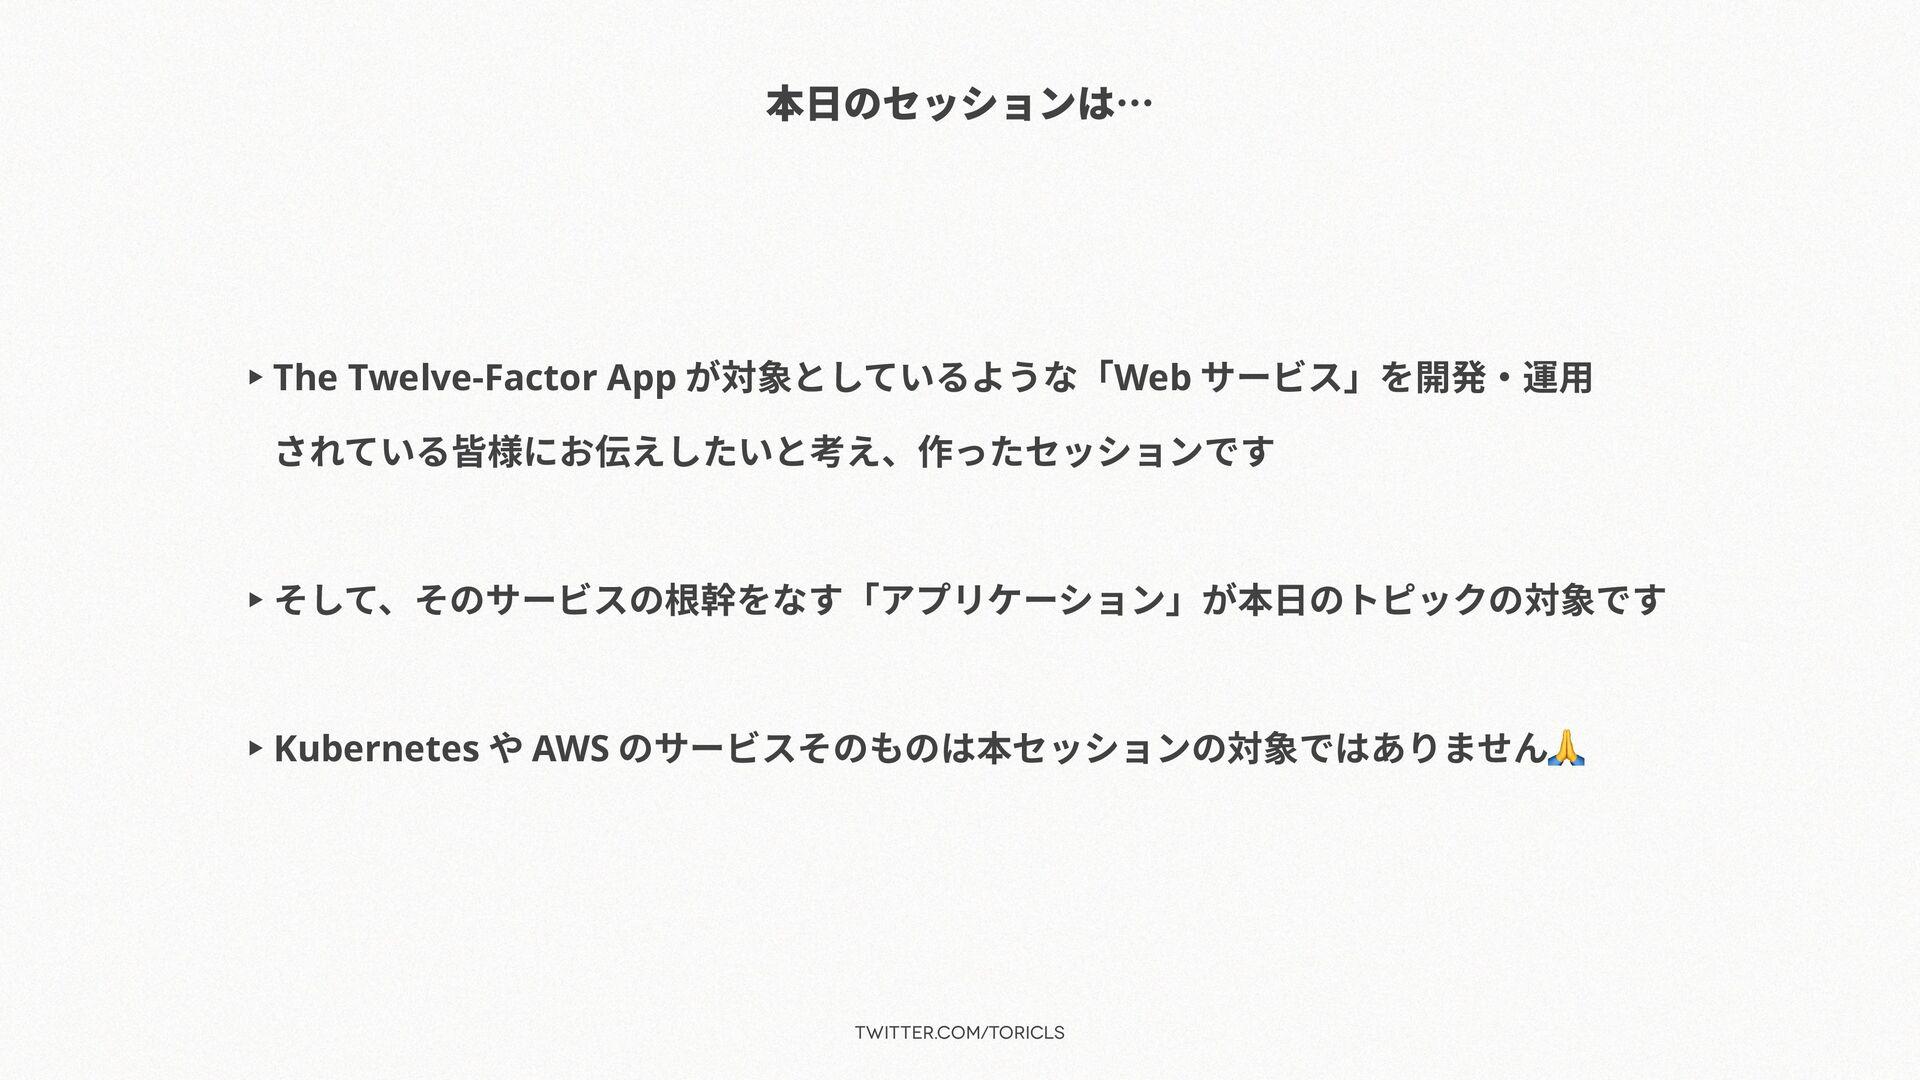 twitter.com/toricls 本⽇のセッションは… ▶︎ The Twelve-Fa...